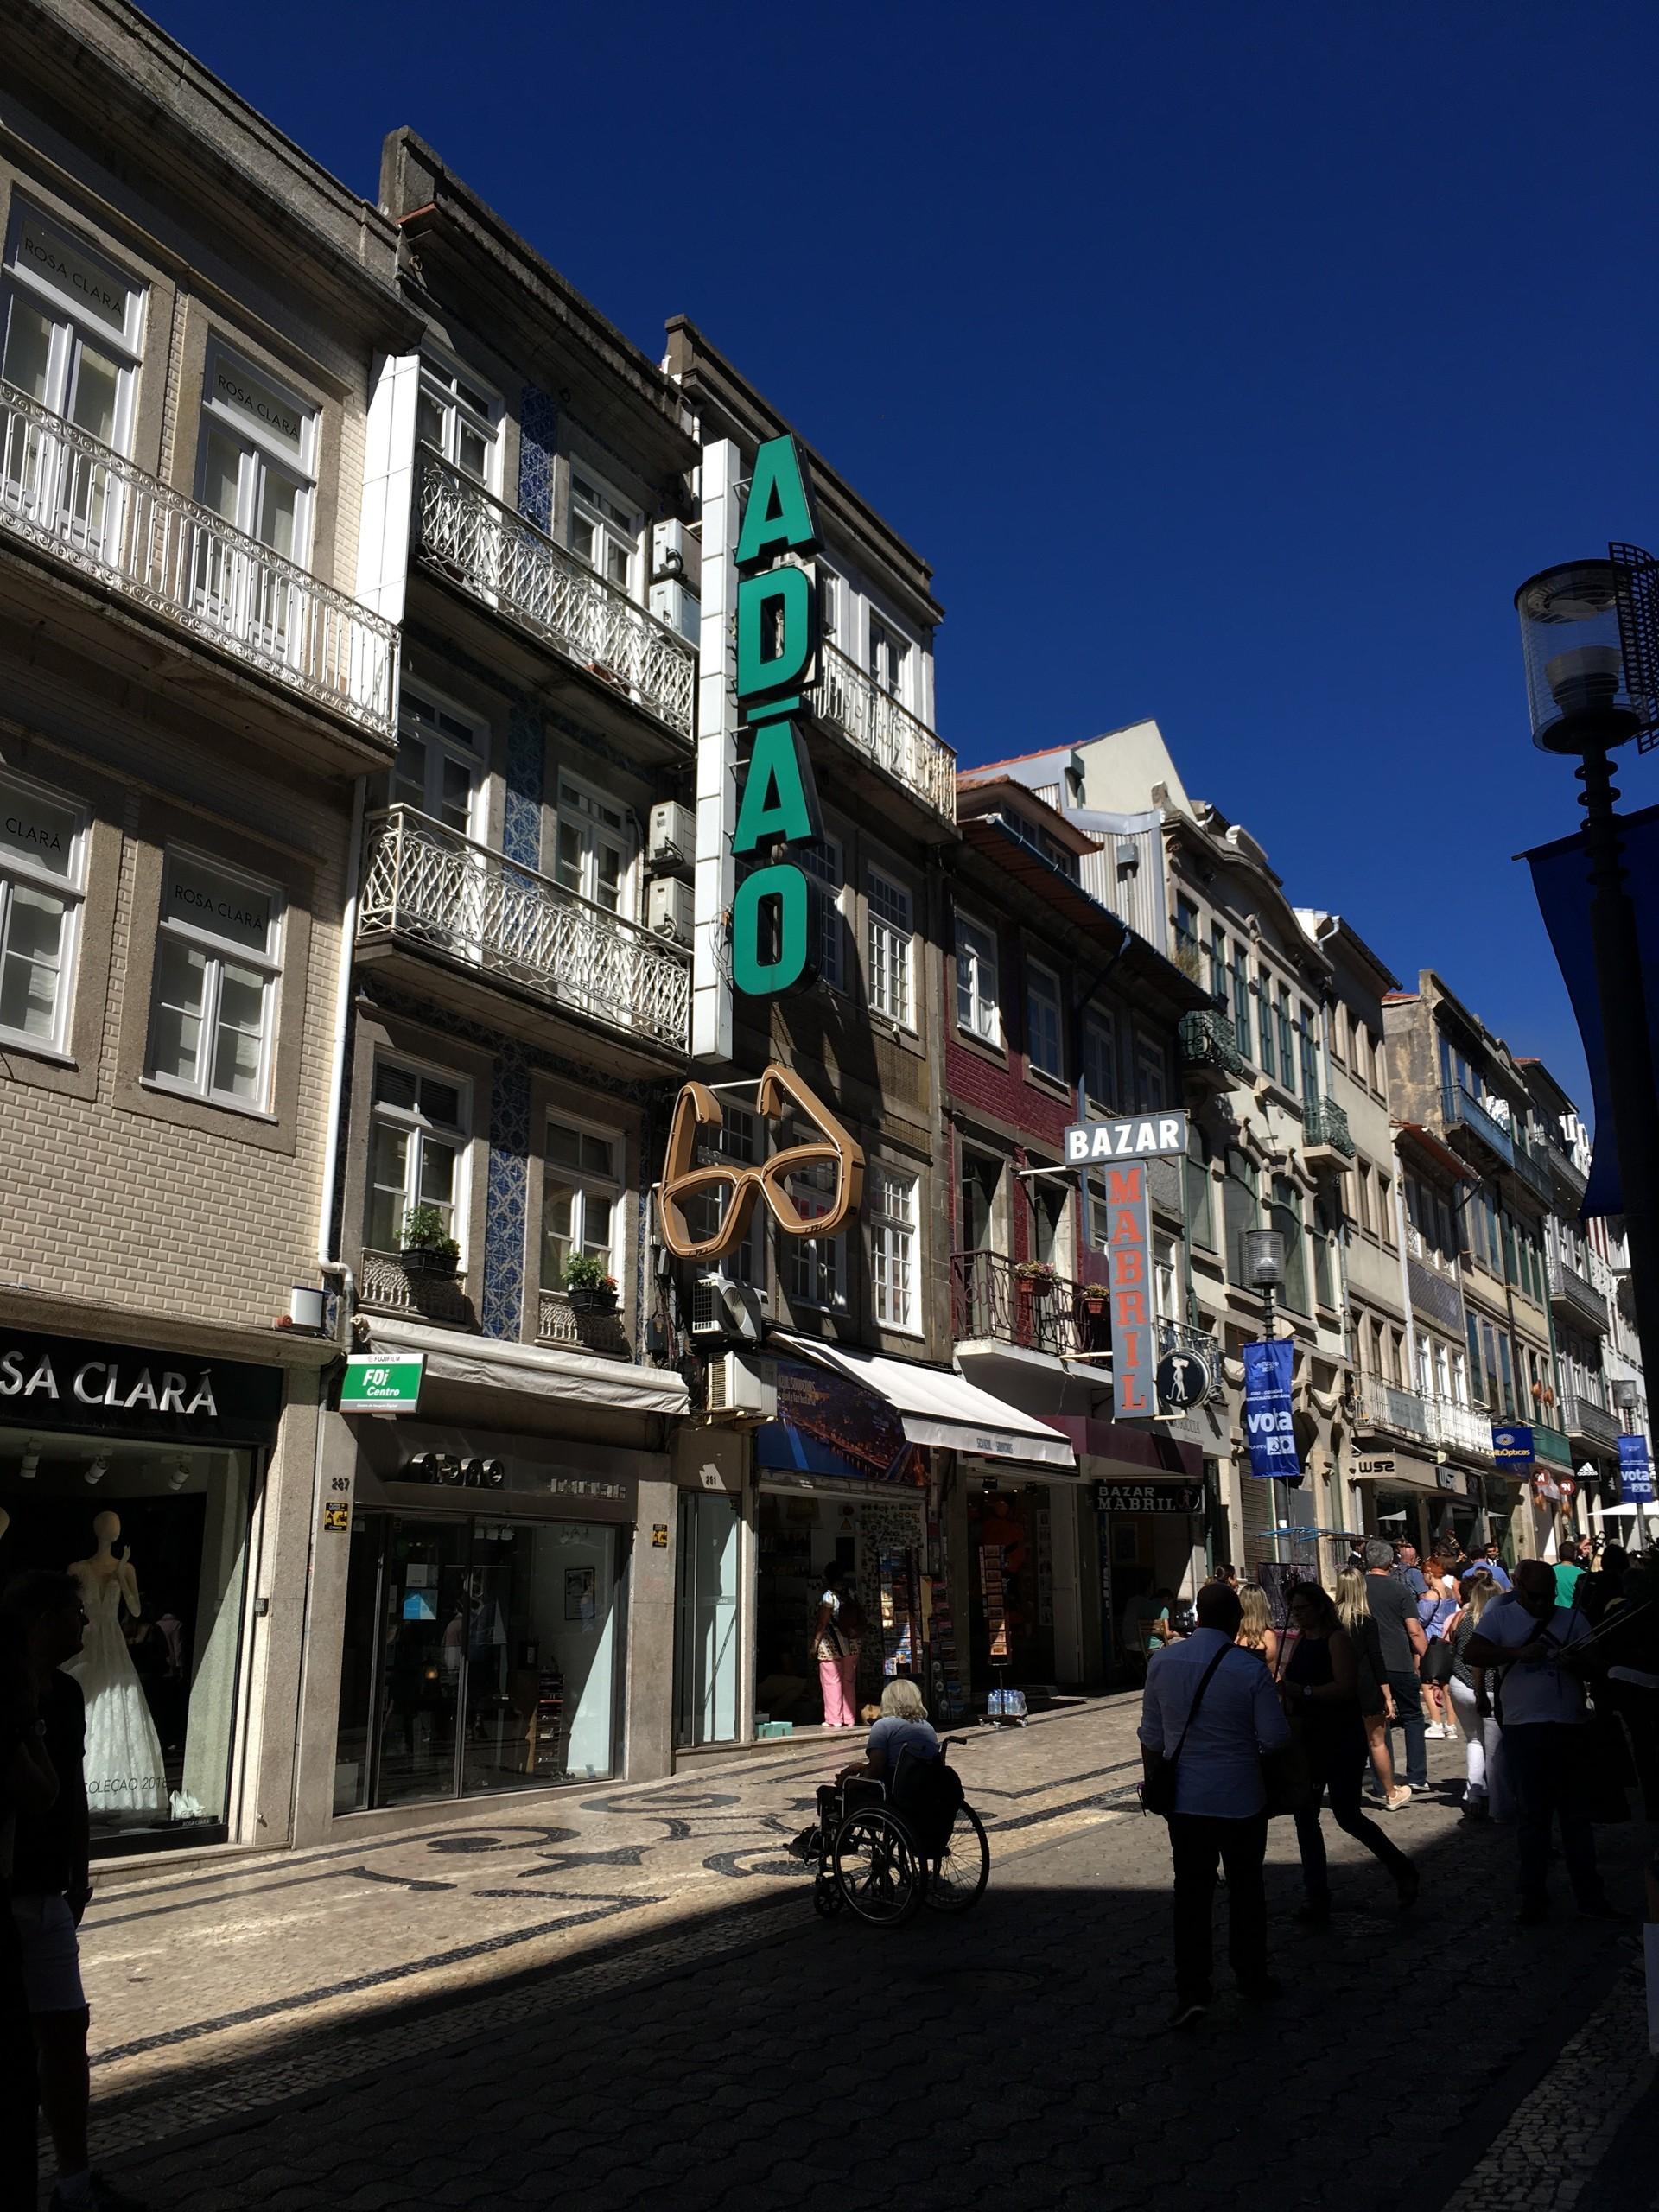 Touristic street